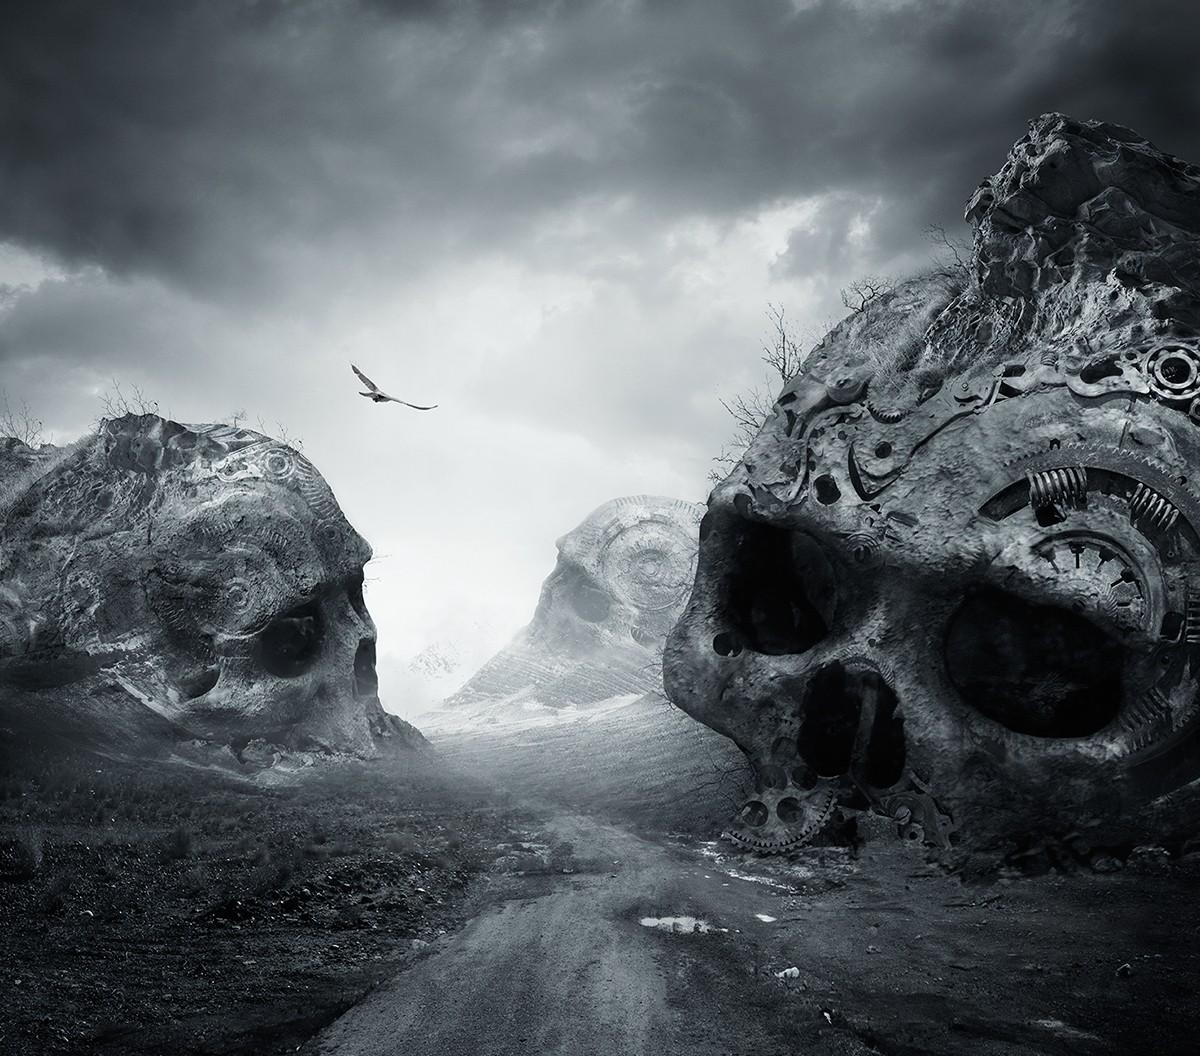 General 1200x1056 nature landscape dirtroad death monochrome birds flying dark skull photo manipulation